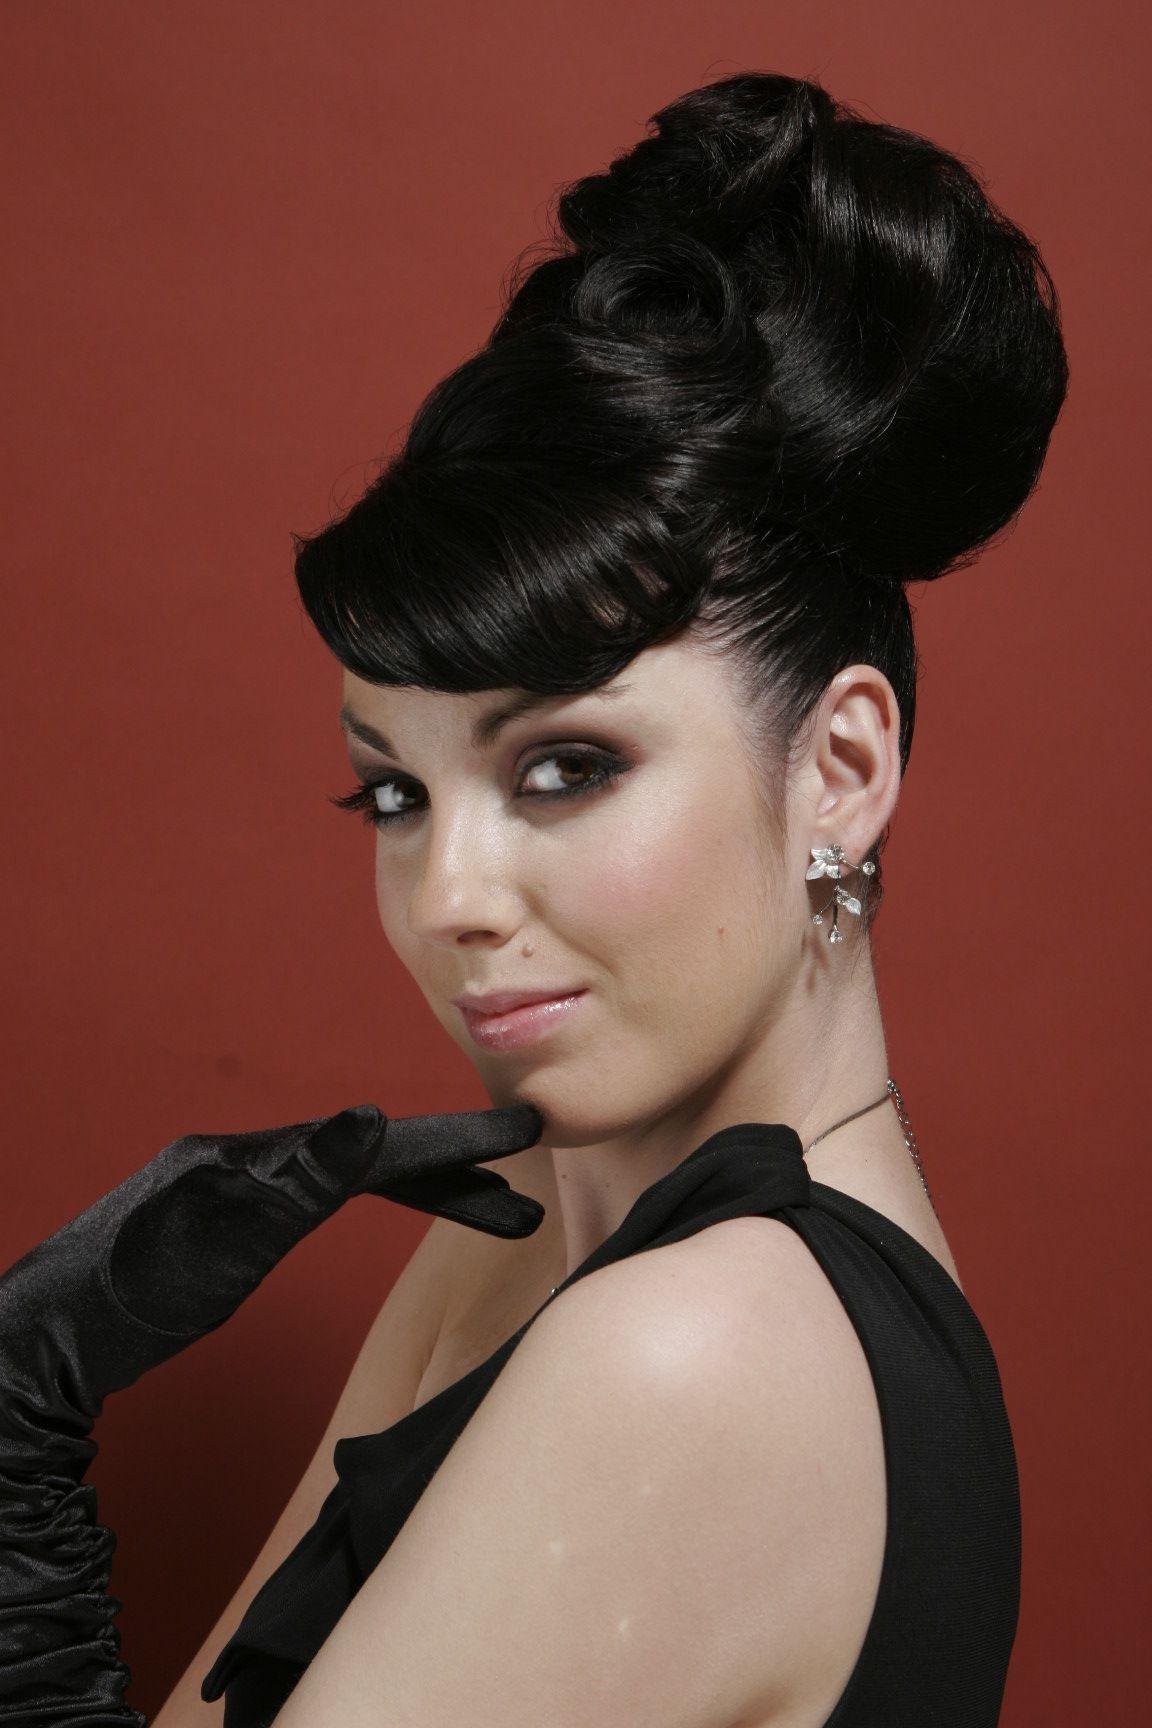 Audrey Hepburn Insired Look I Love A Bit Of Audrey Hair Makeup Hair Styles Audrey Hepburn